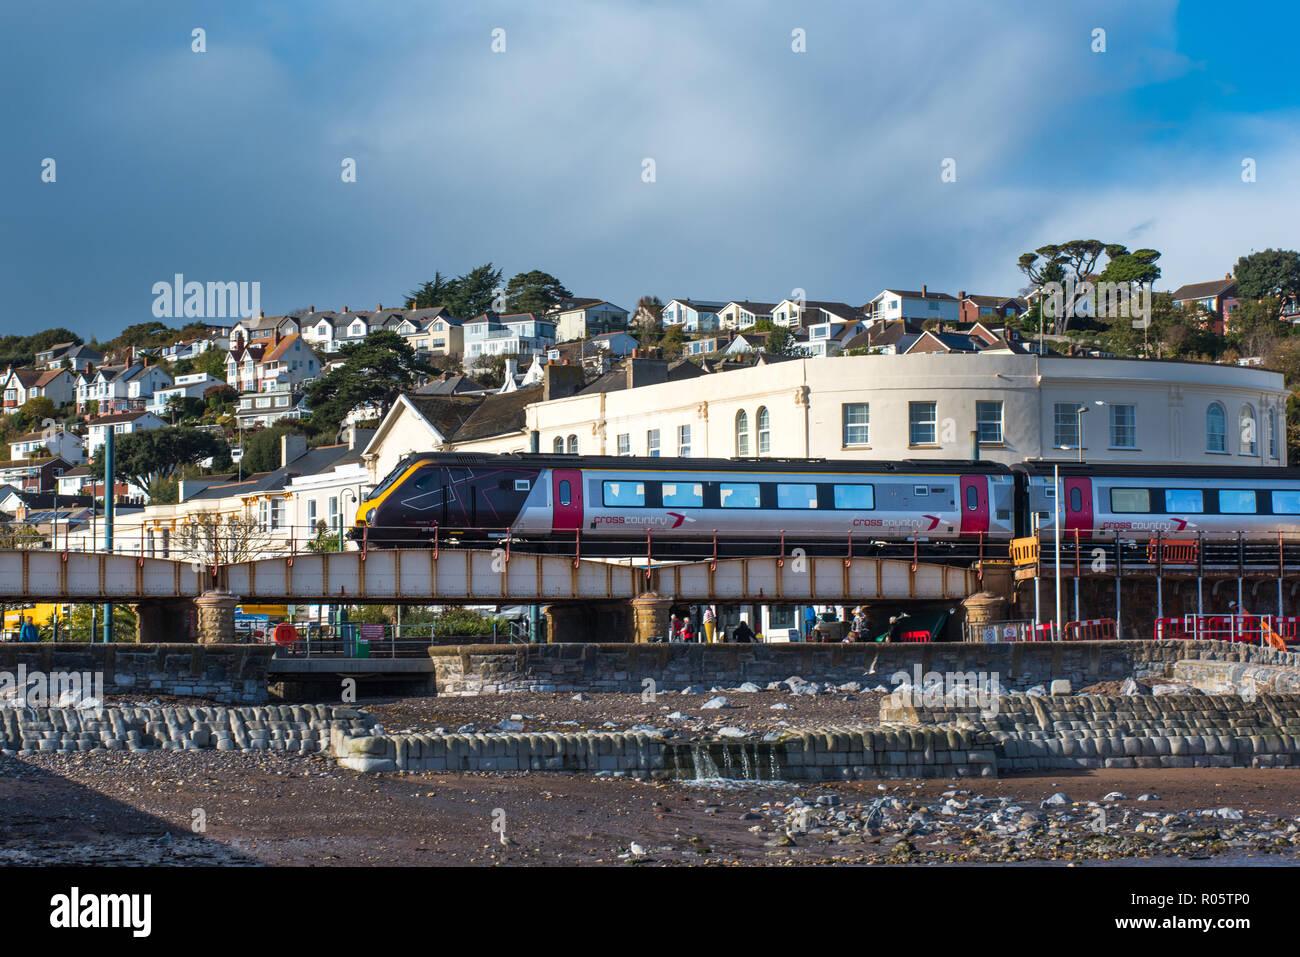 DAWLISH, DEVON, UK - 26OCT2018: Arriva Cross Country Class 221 High Speed Train 221139 passing through Dawlish. - Stock Image